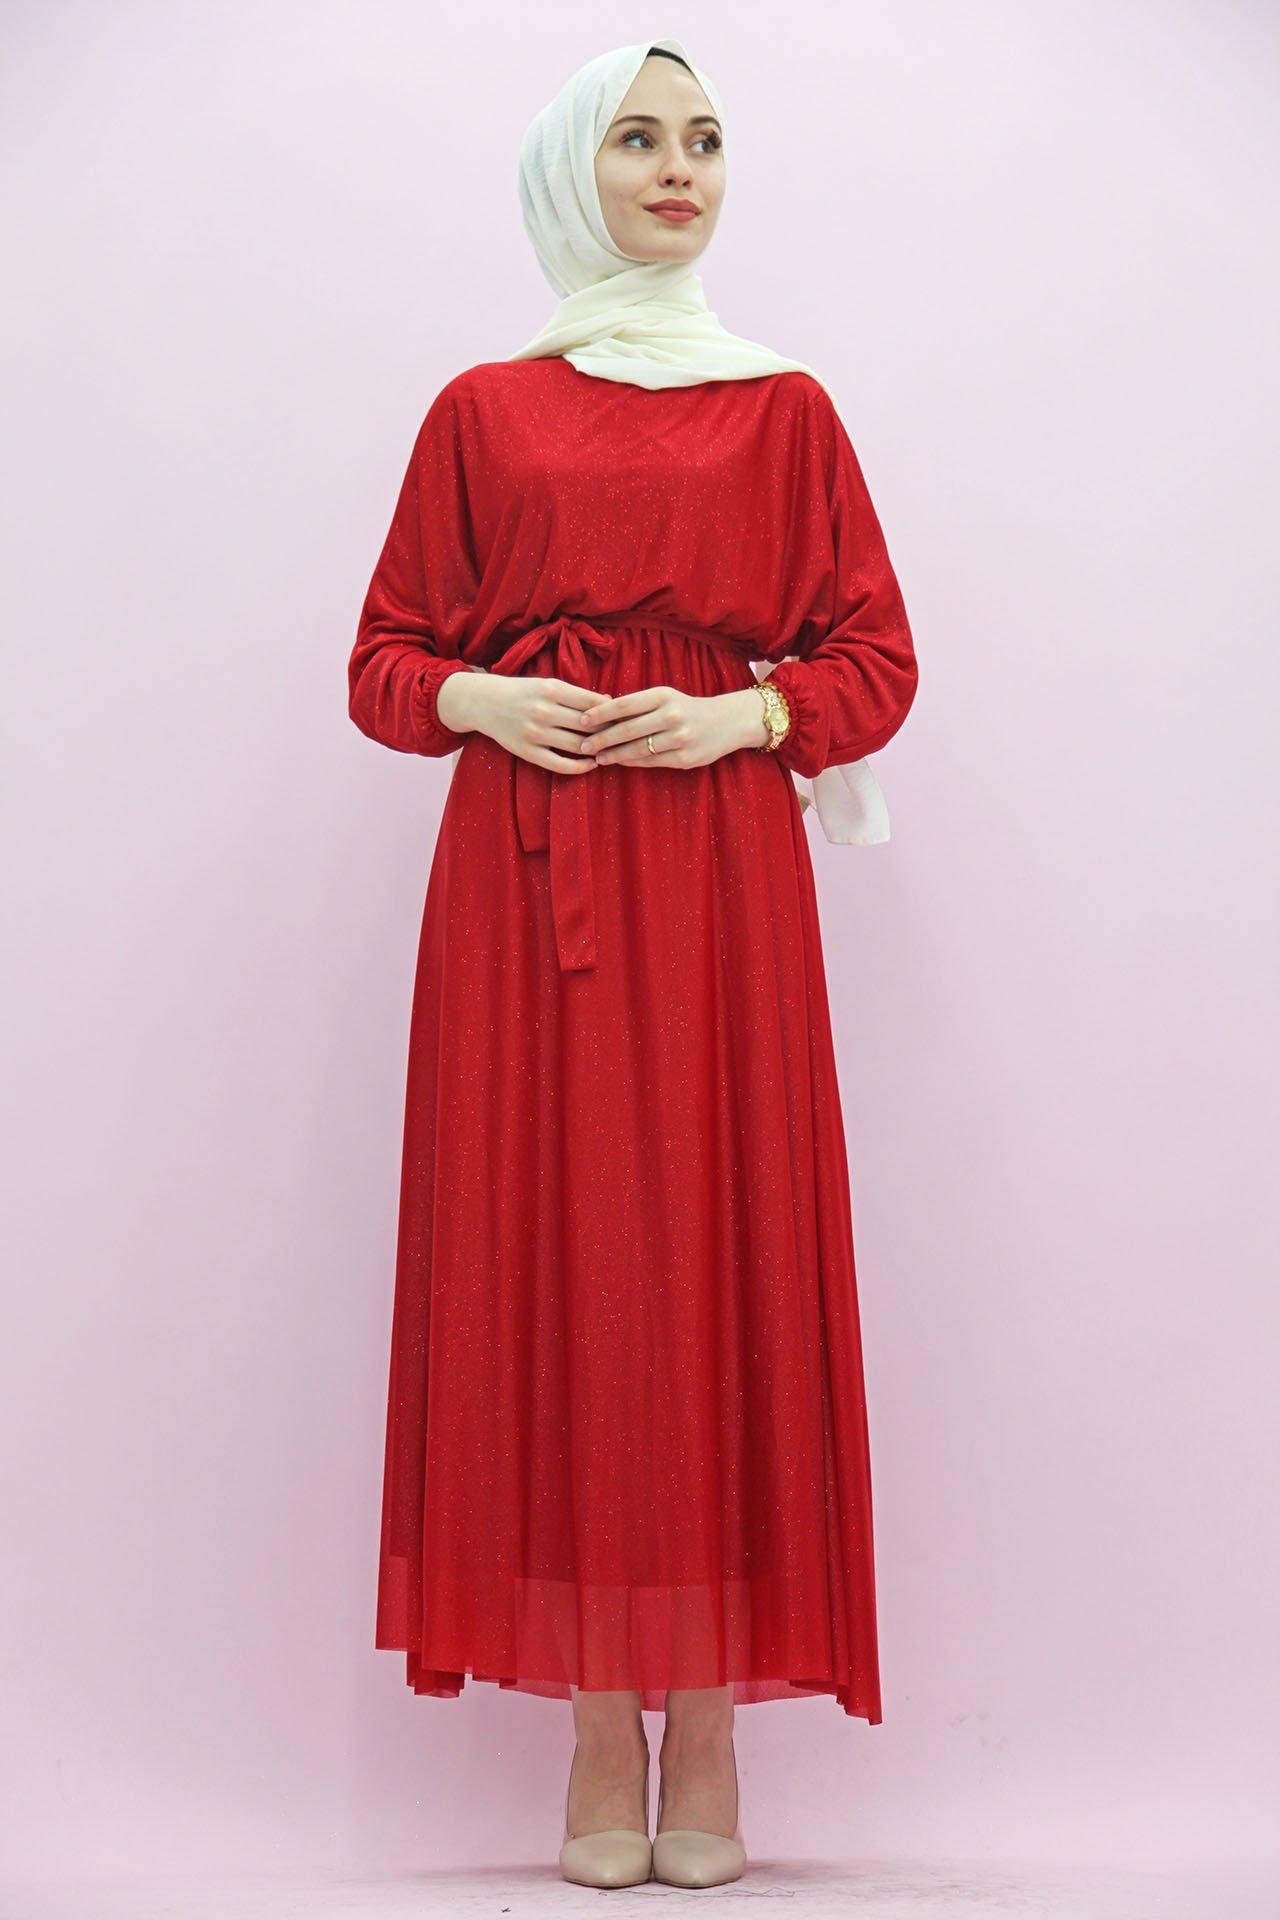 GİZAGİYİM - Giza Simli Şifon Elbise Kırmızı